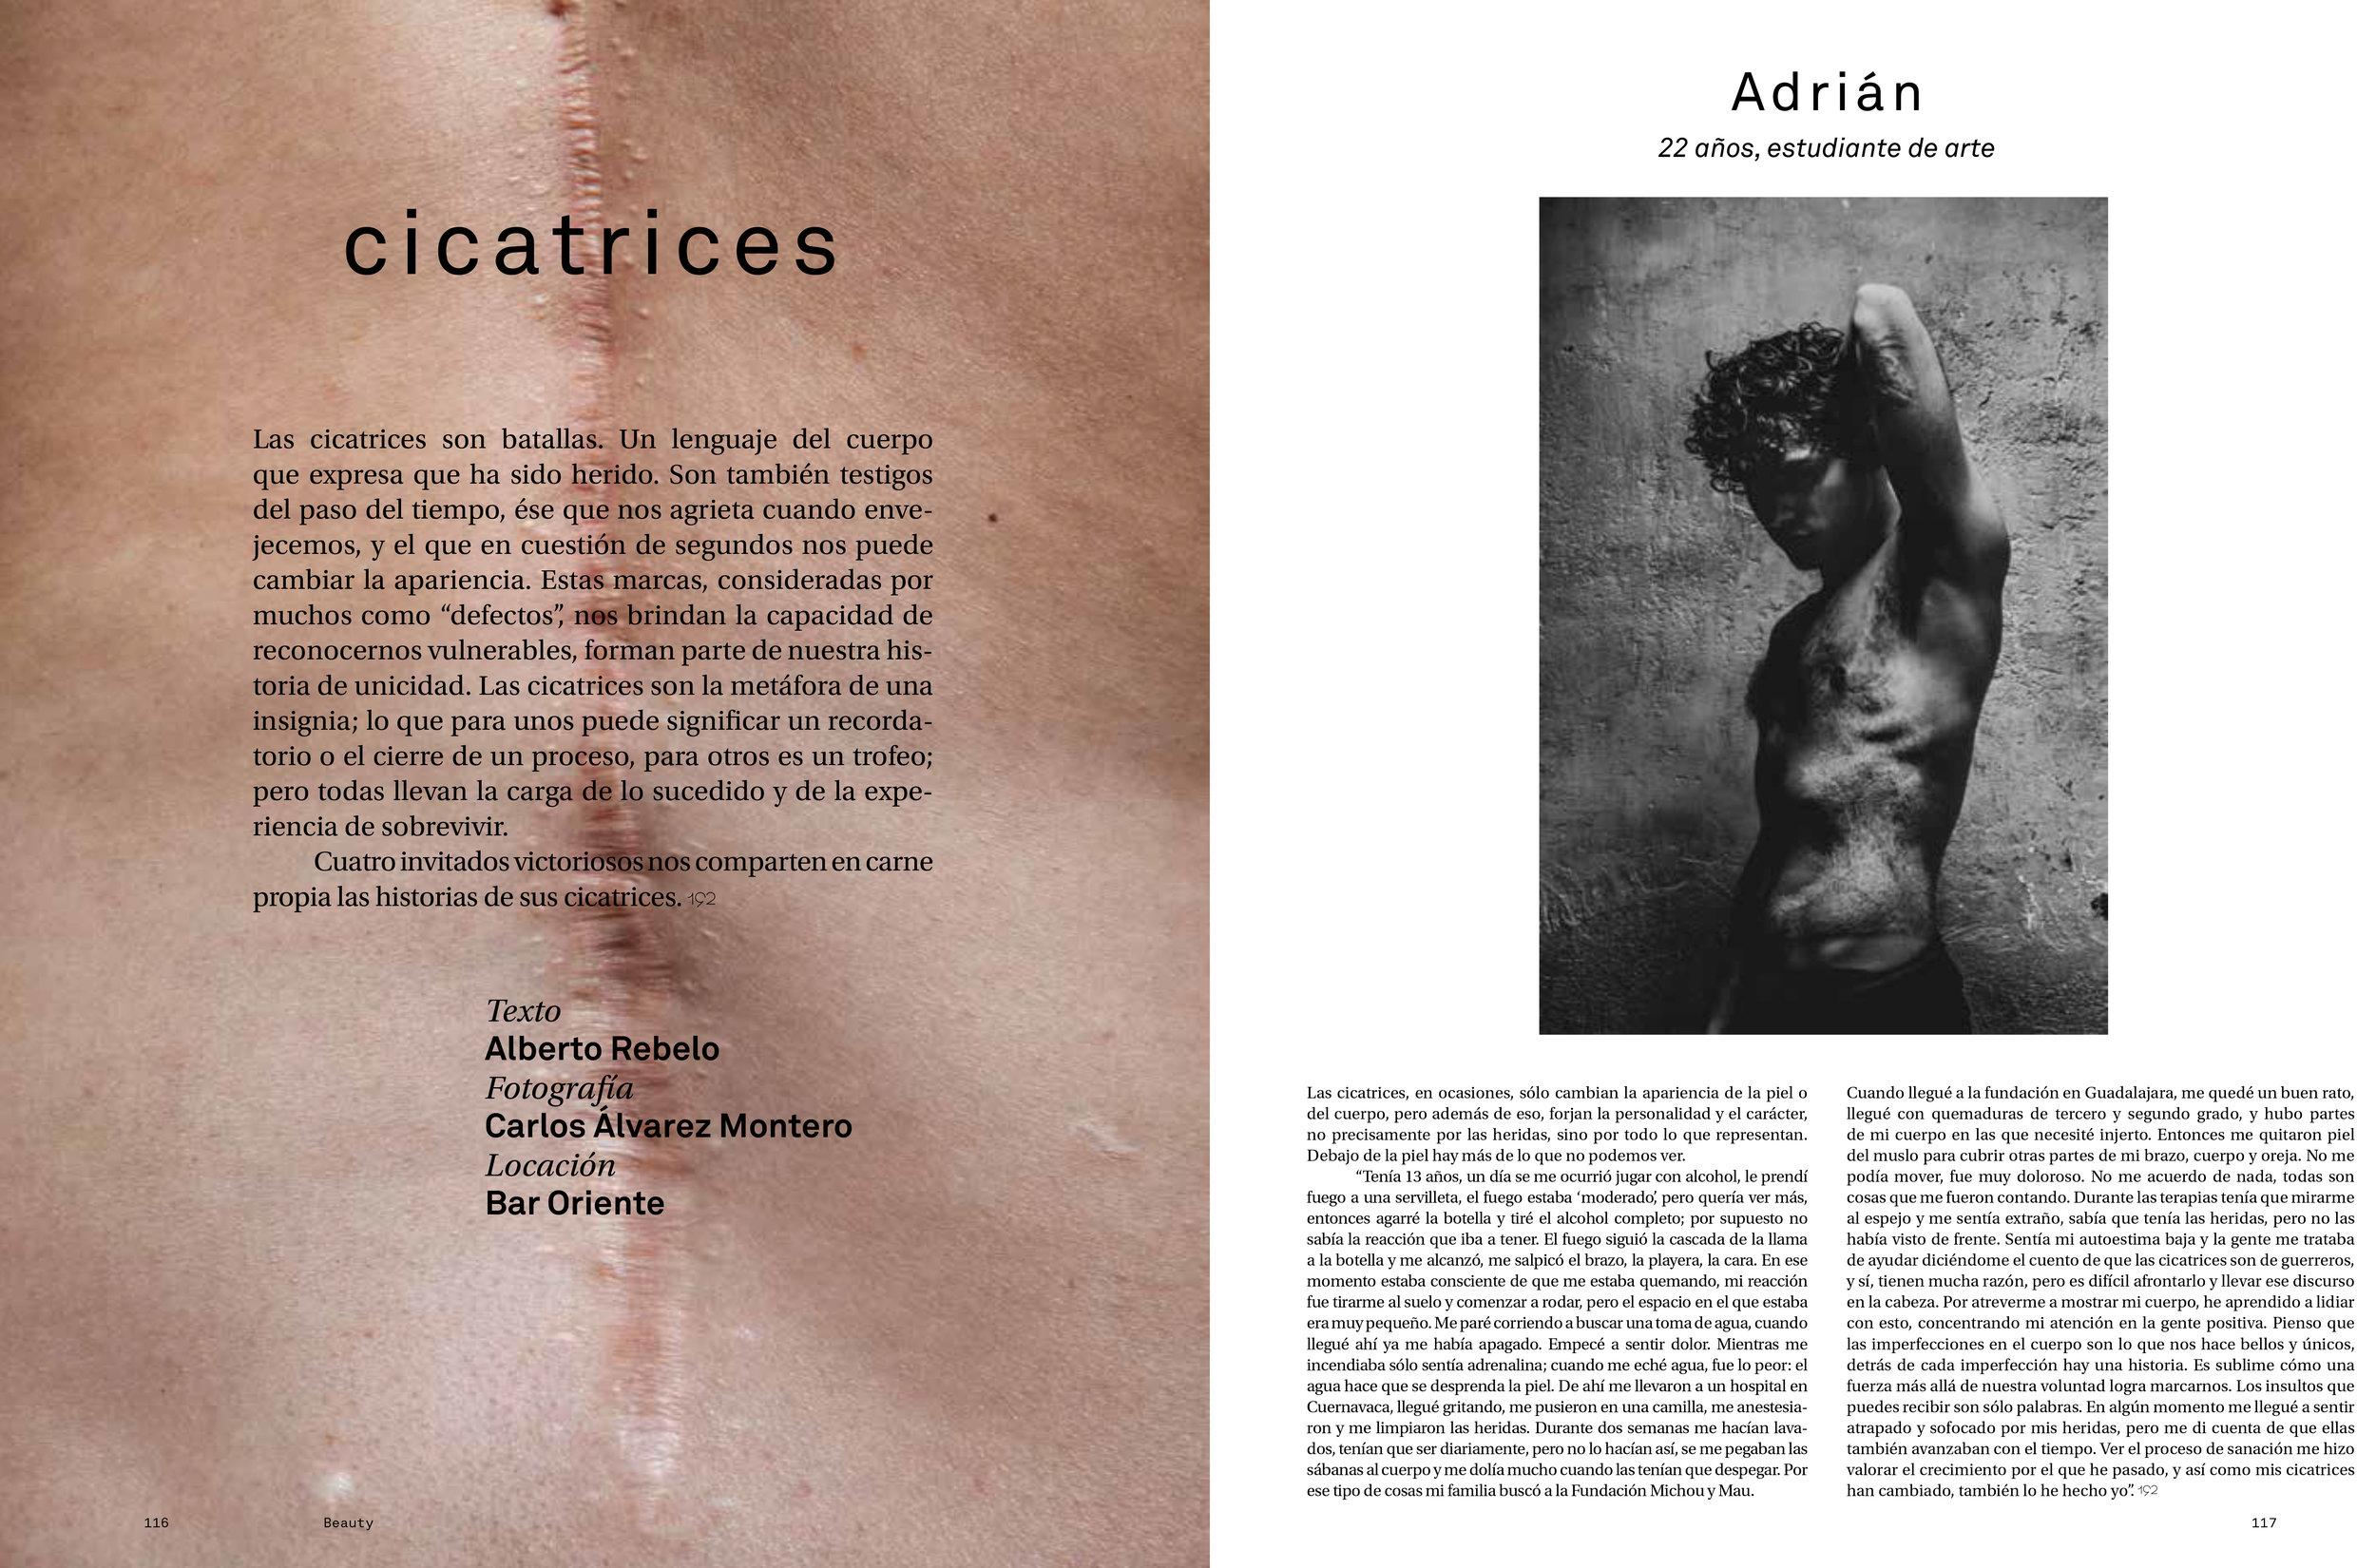 CICATRICES-1.jpg